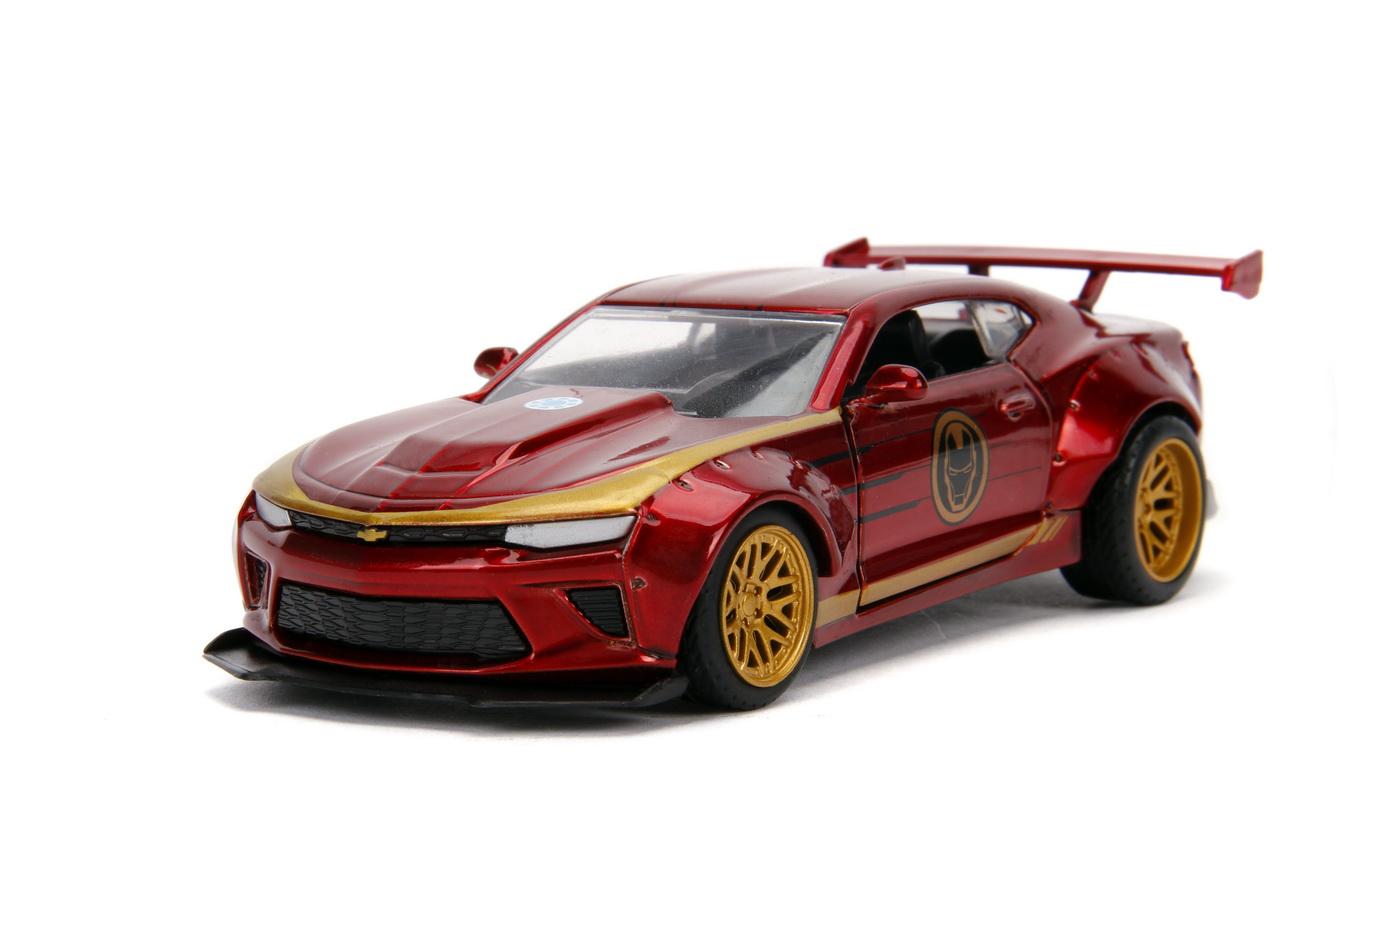 Masinuta Metalica Iron Man 2016 Chevy Camaro Ss Scara 1 La 32 | JadaToys - 1